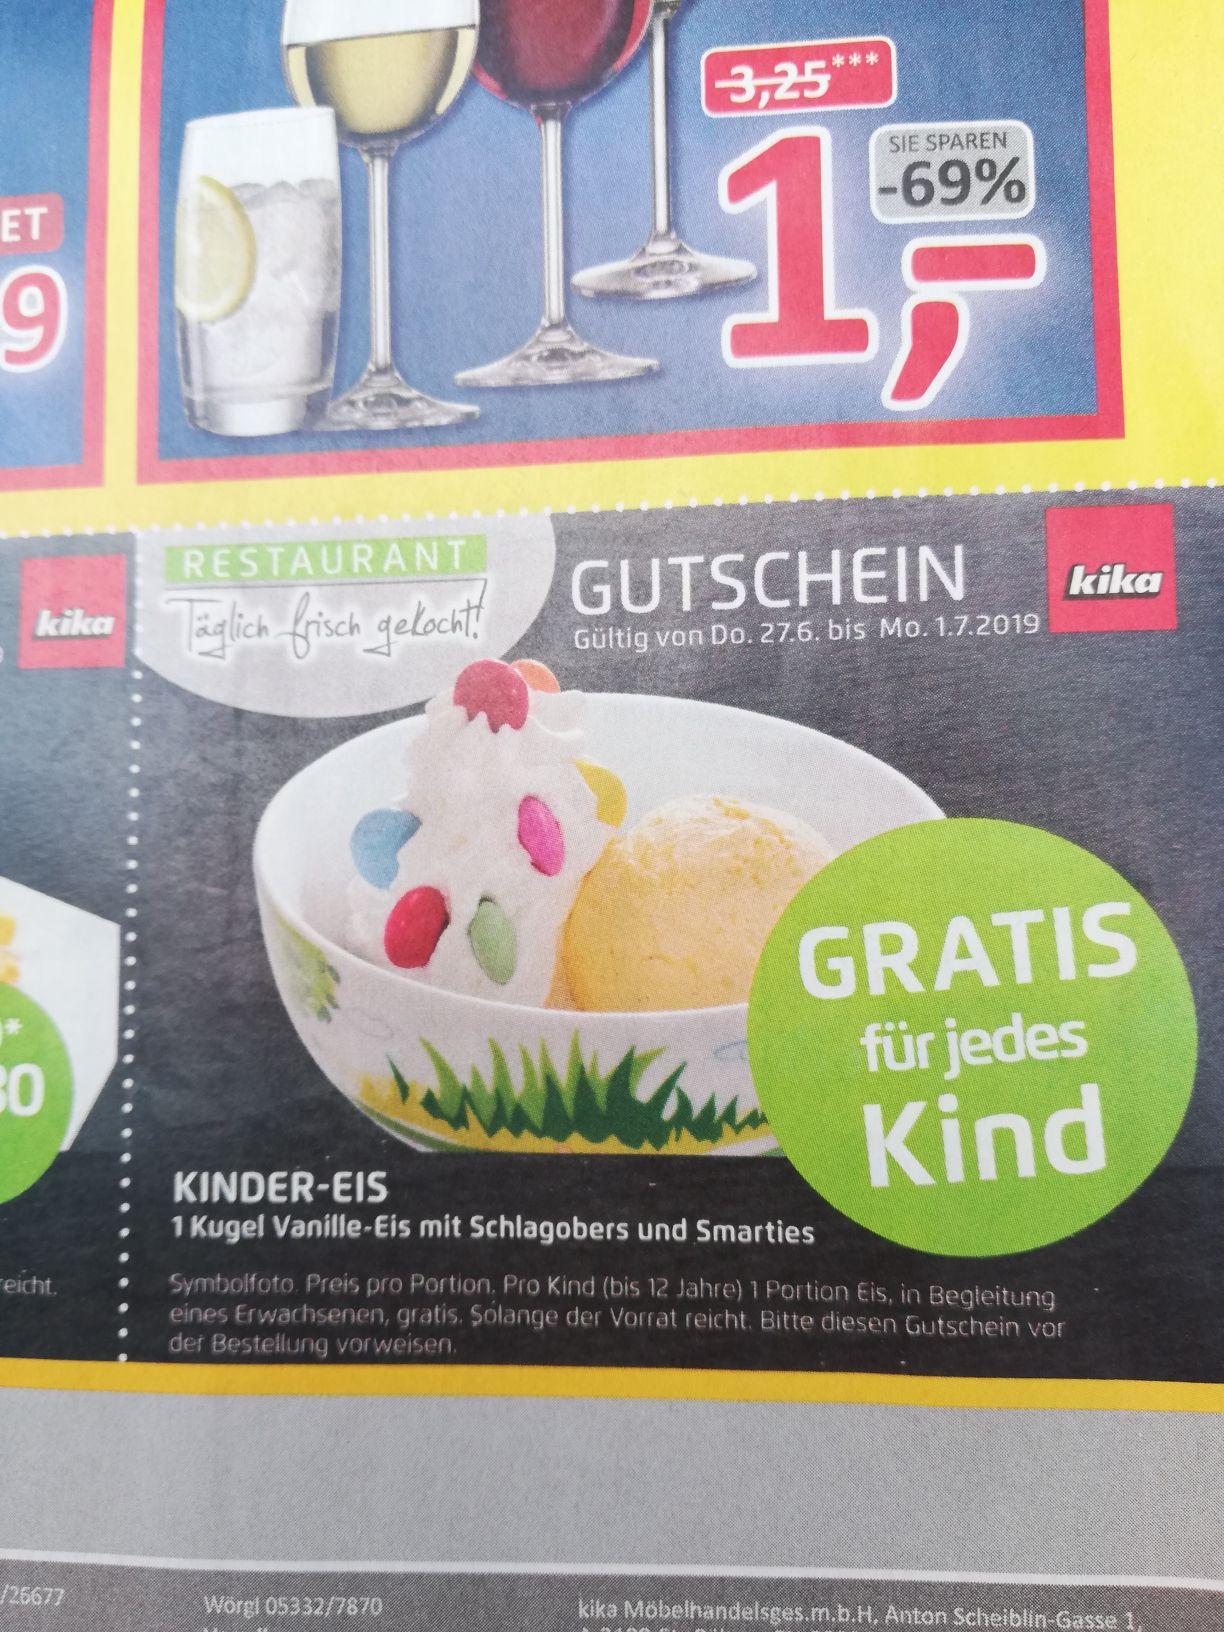 Kika gratis Kinder Eis im Restaurant